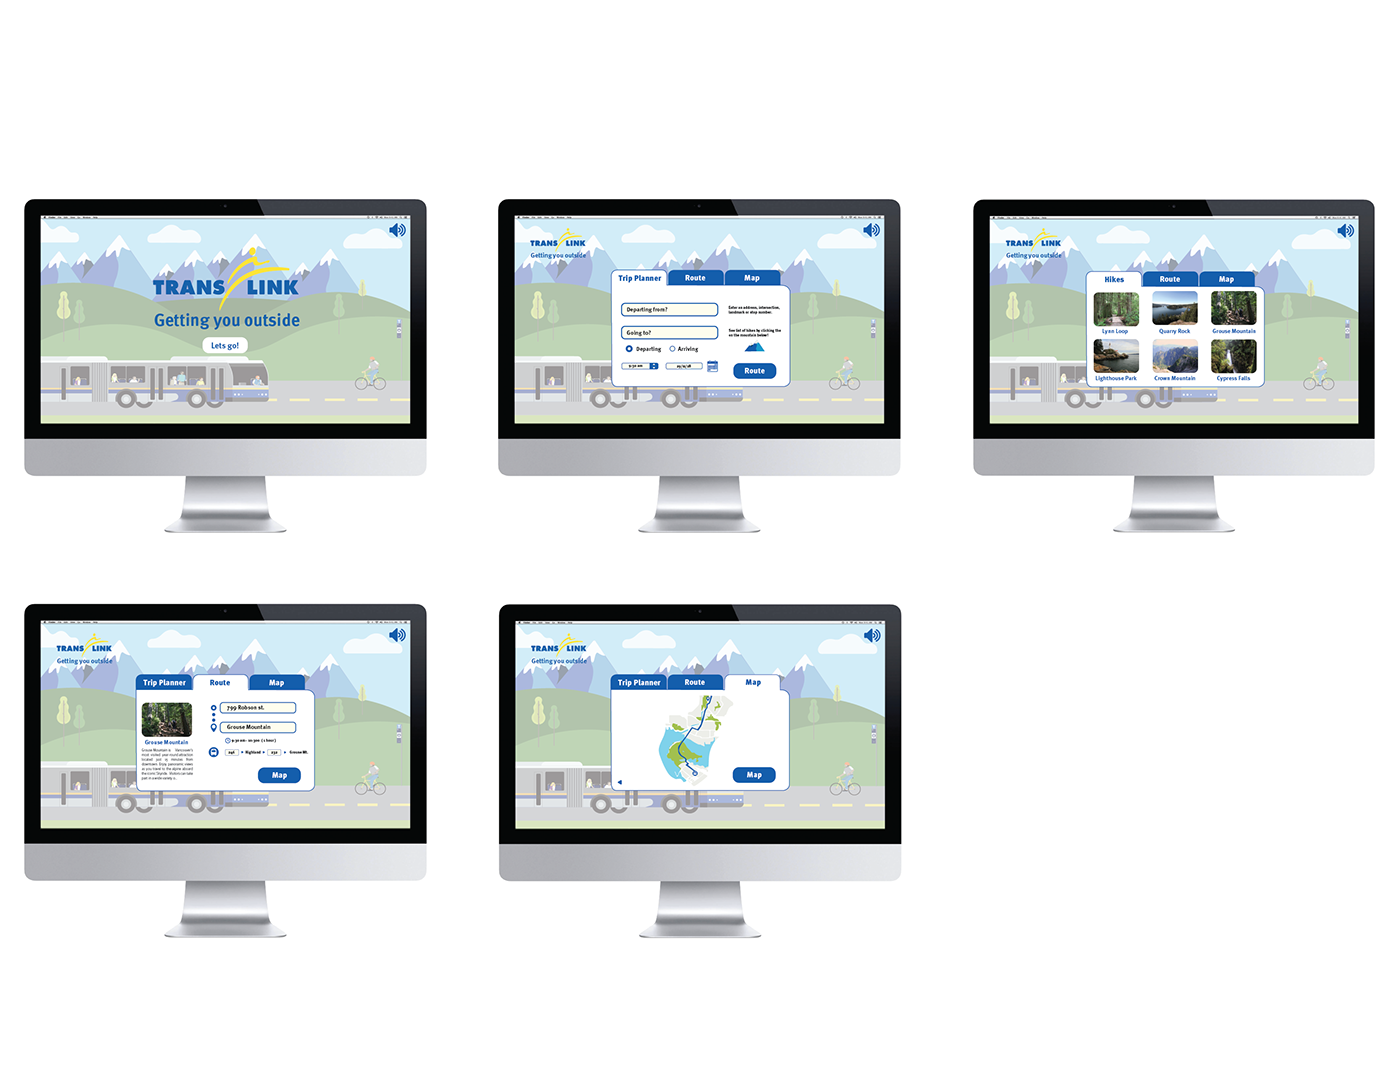 Image may contain: electronics, computer monitor and screenshot